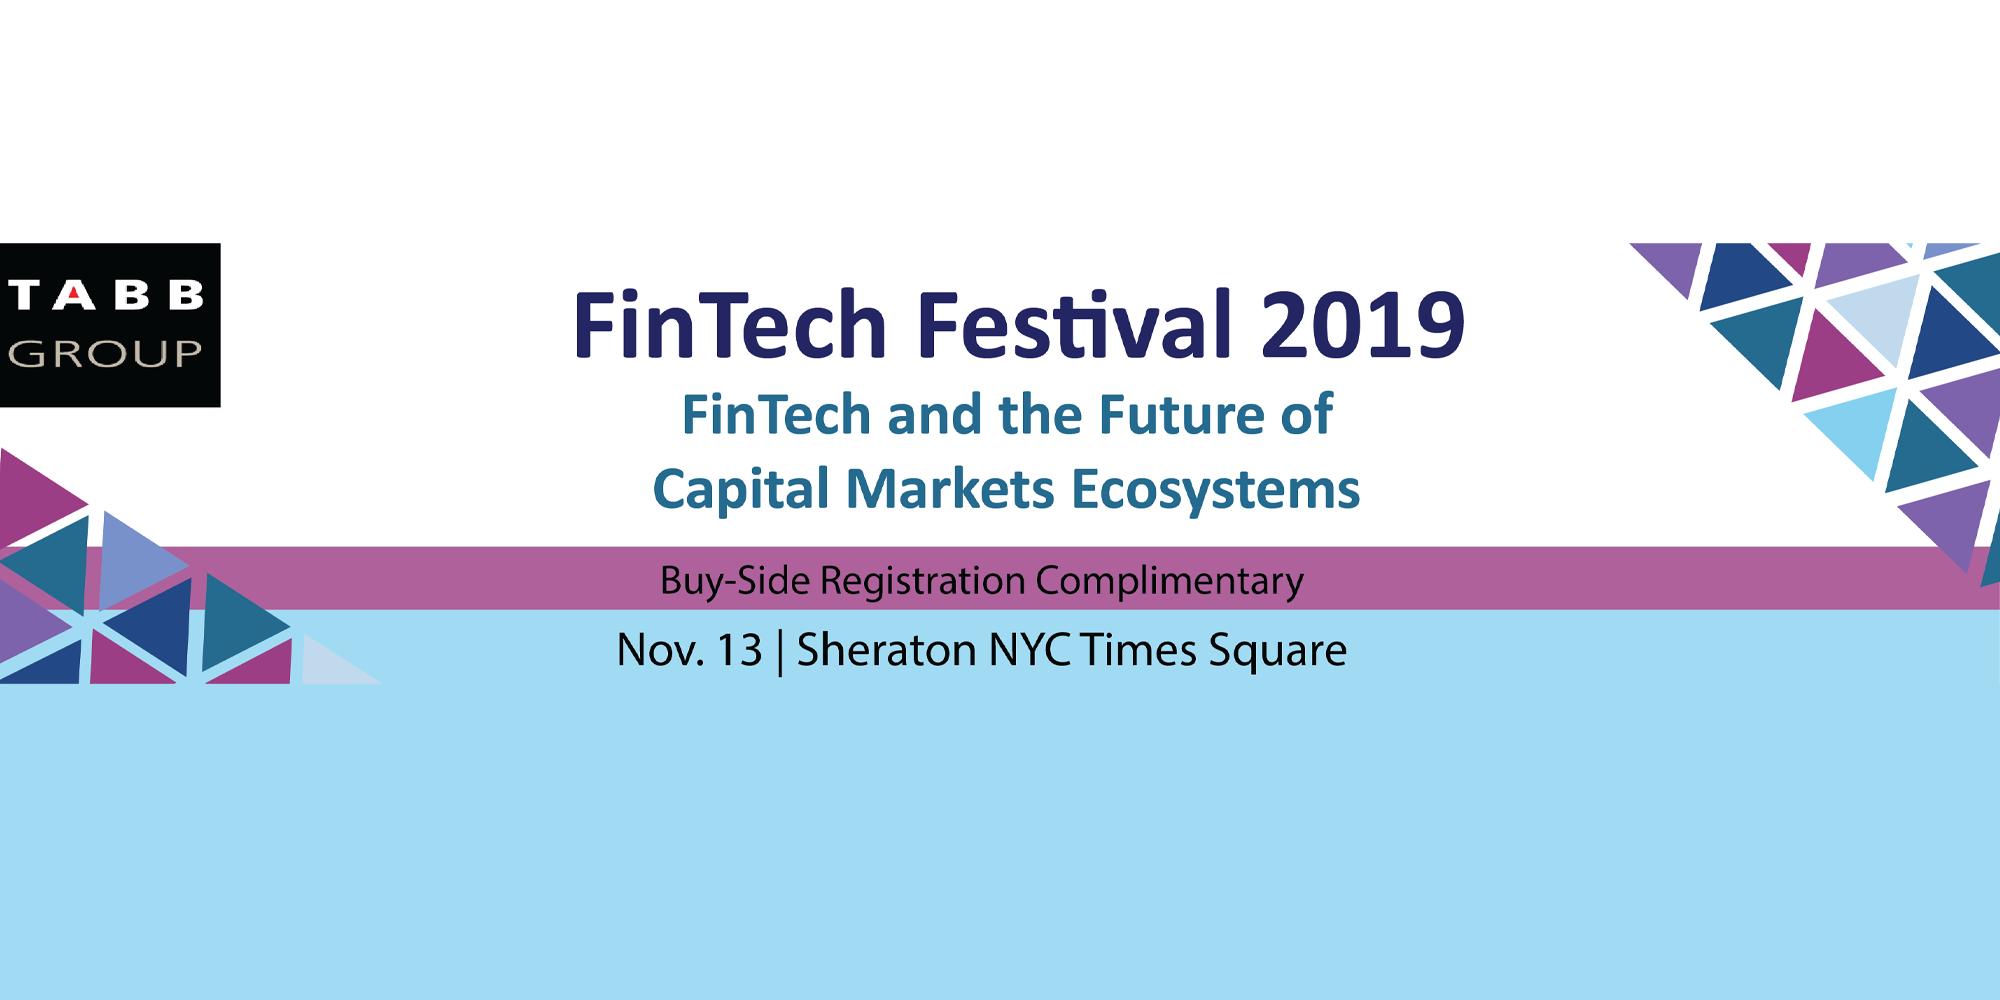 tabb-group-fintech-festival-2019